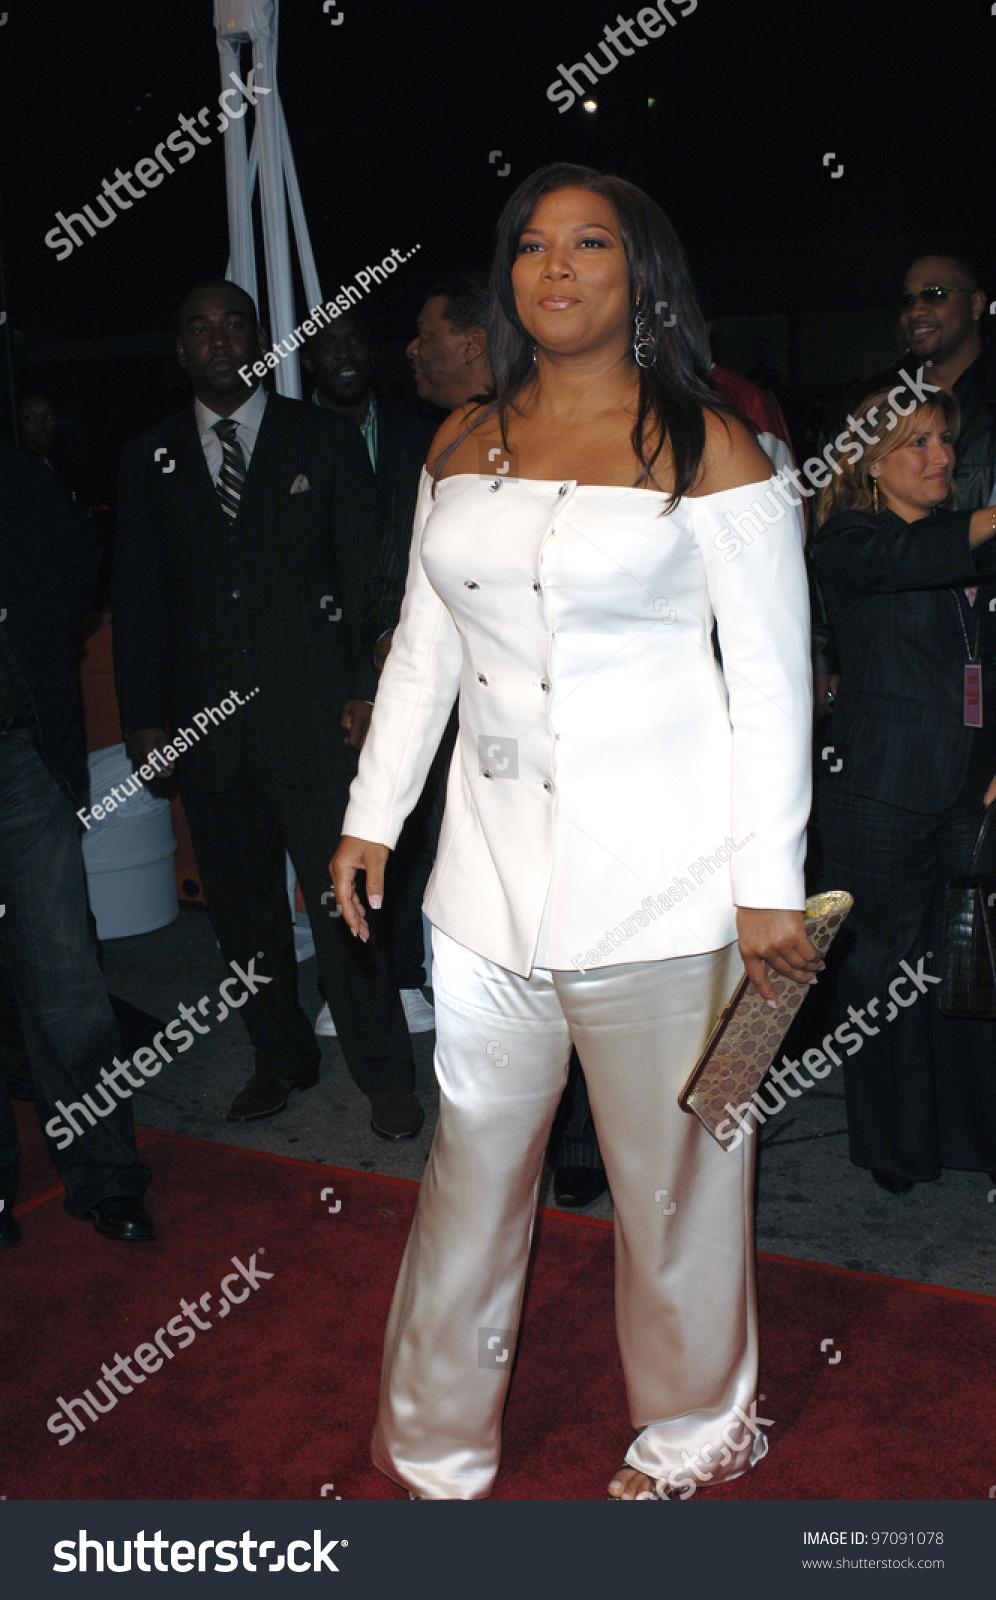 Actress Queen Latifah World Premiere Her Stock Photo 97091078